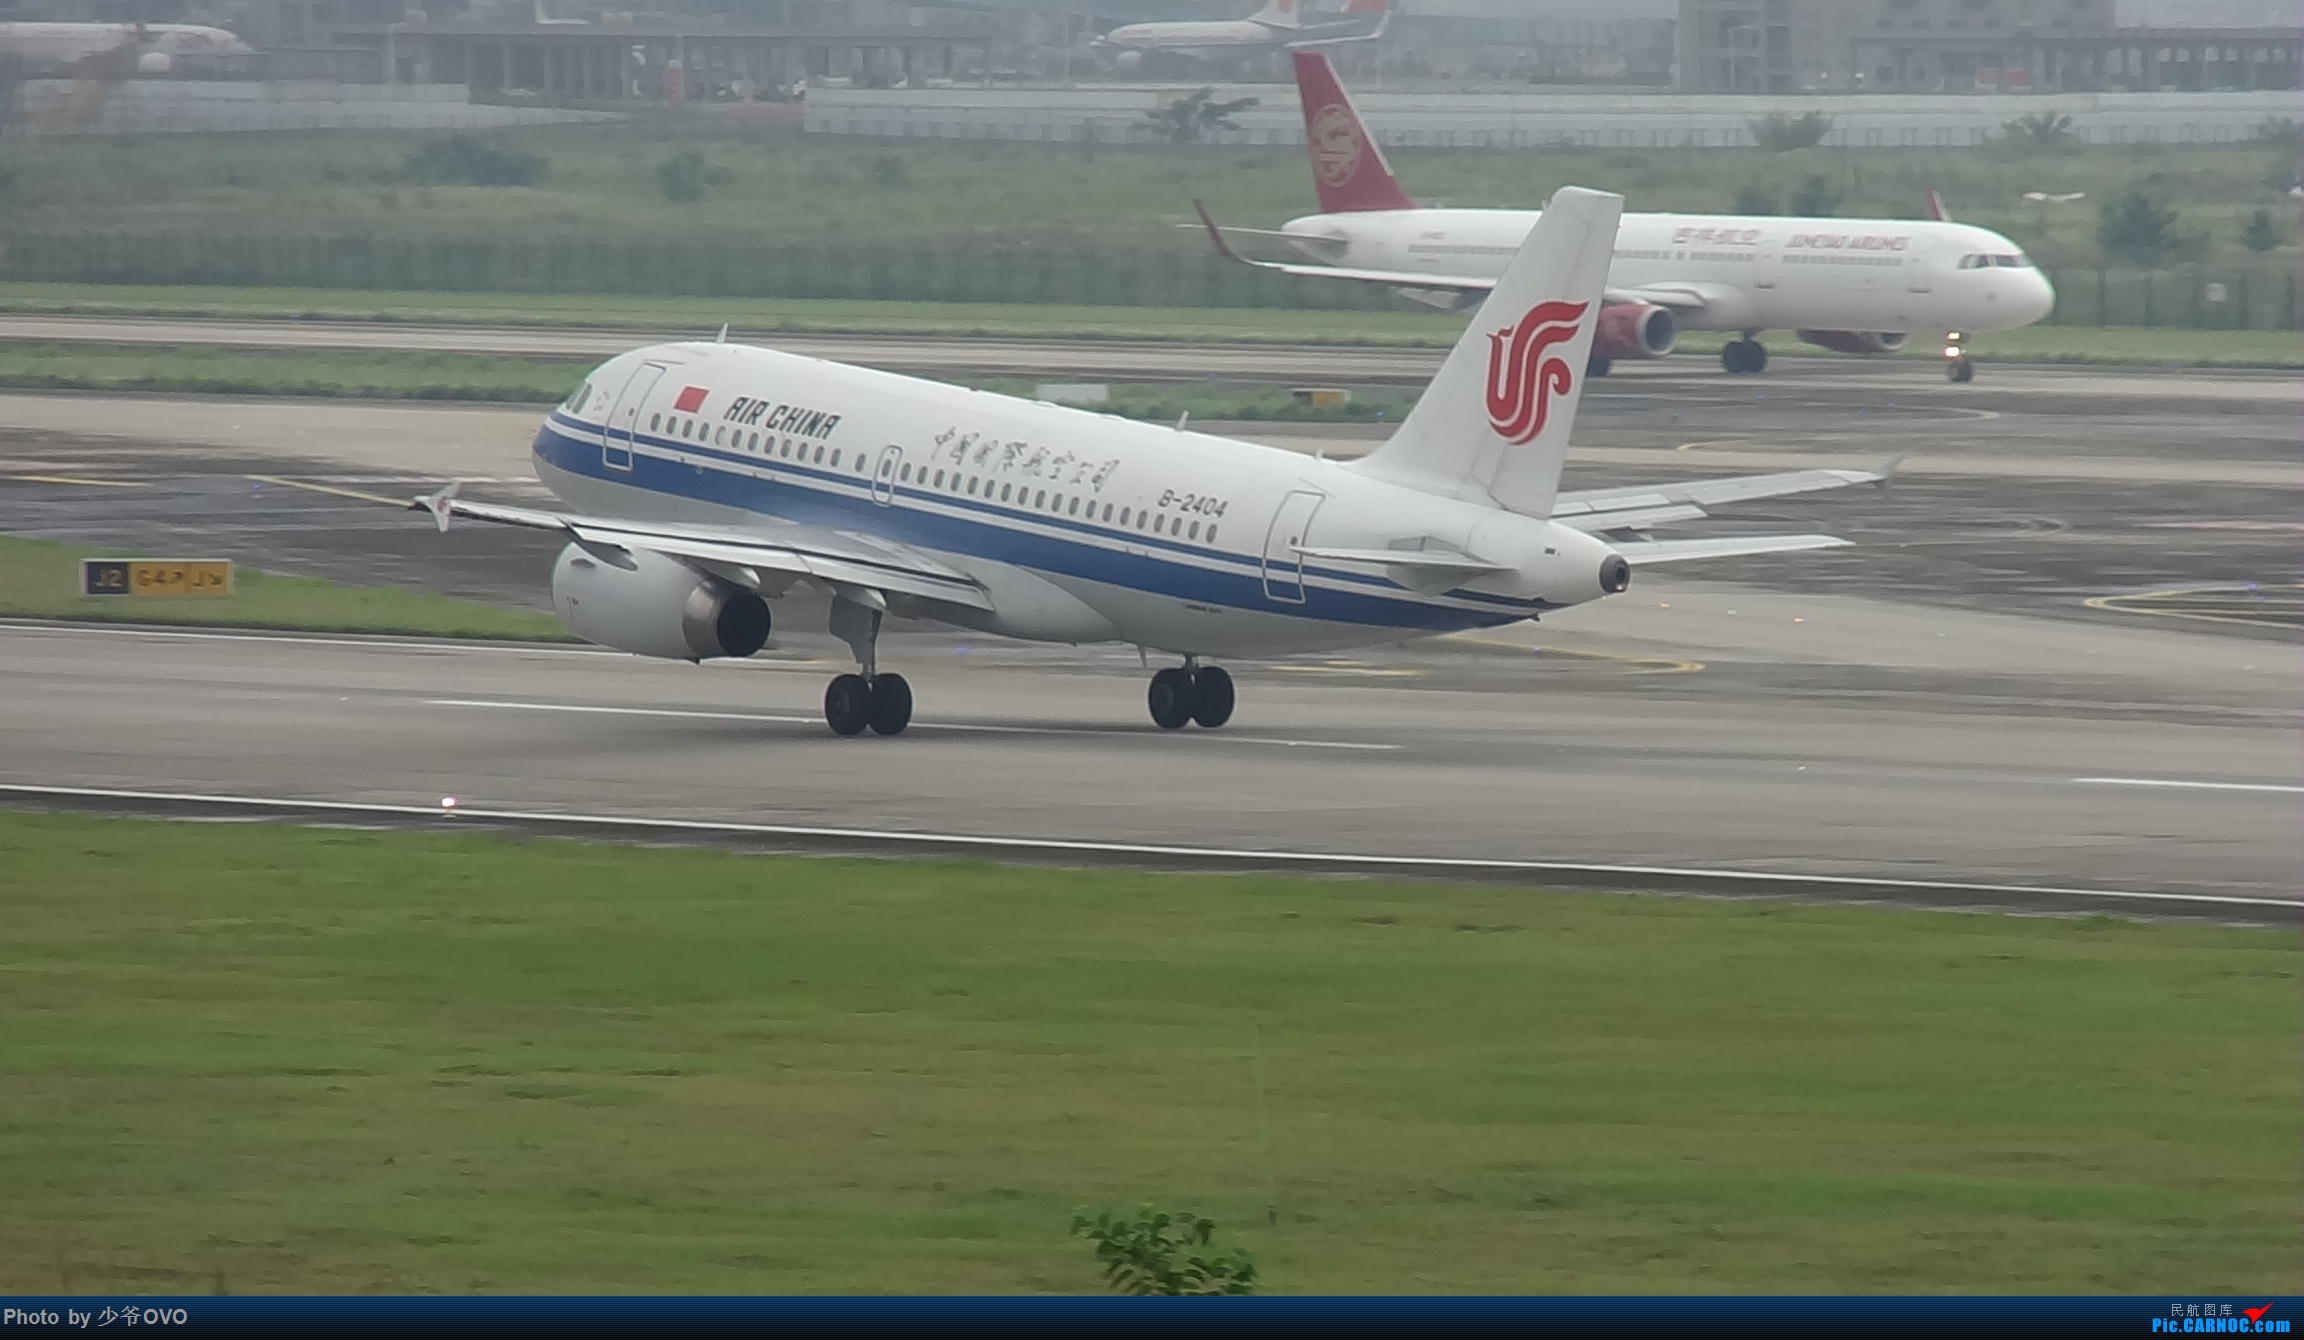 Re:[原创]CKG重庆江北机场拍机 ,中法建交50周年 AIRBUS A319-100 B-2404 中国重庆江北国际机场